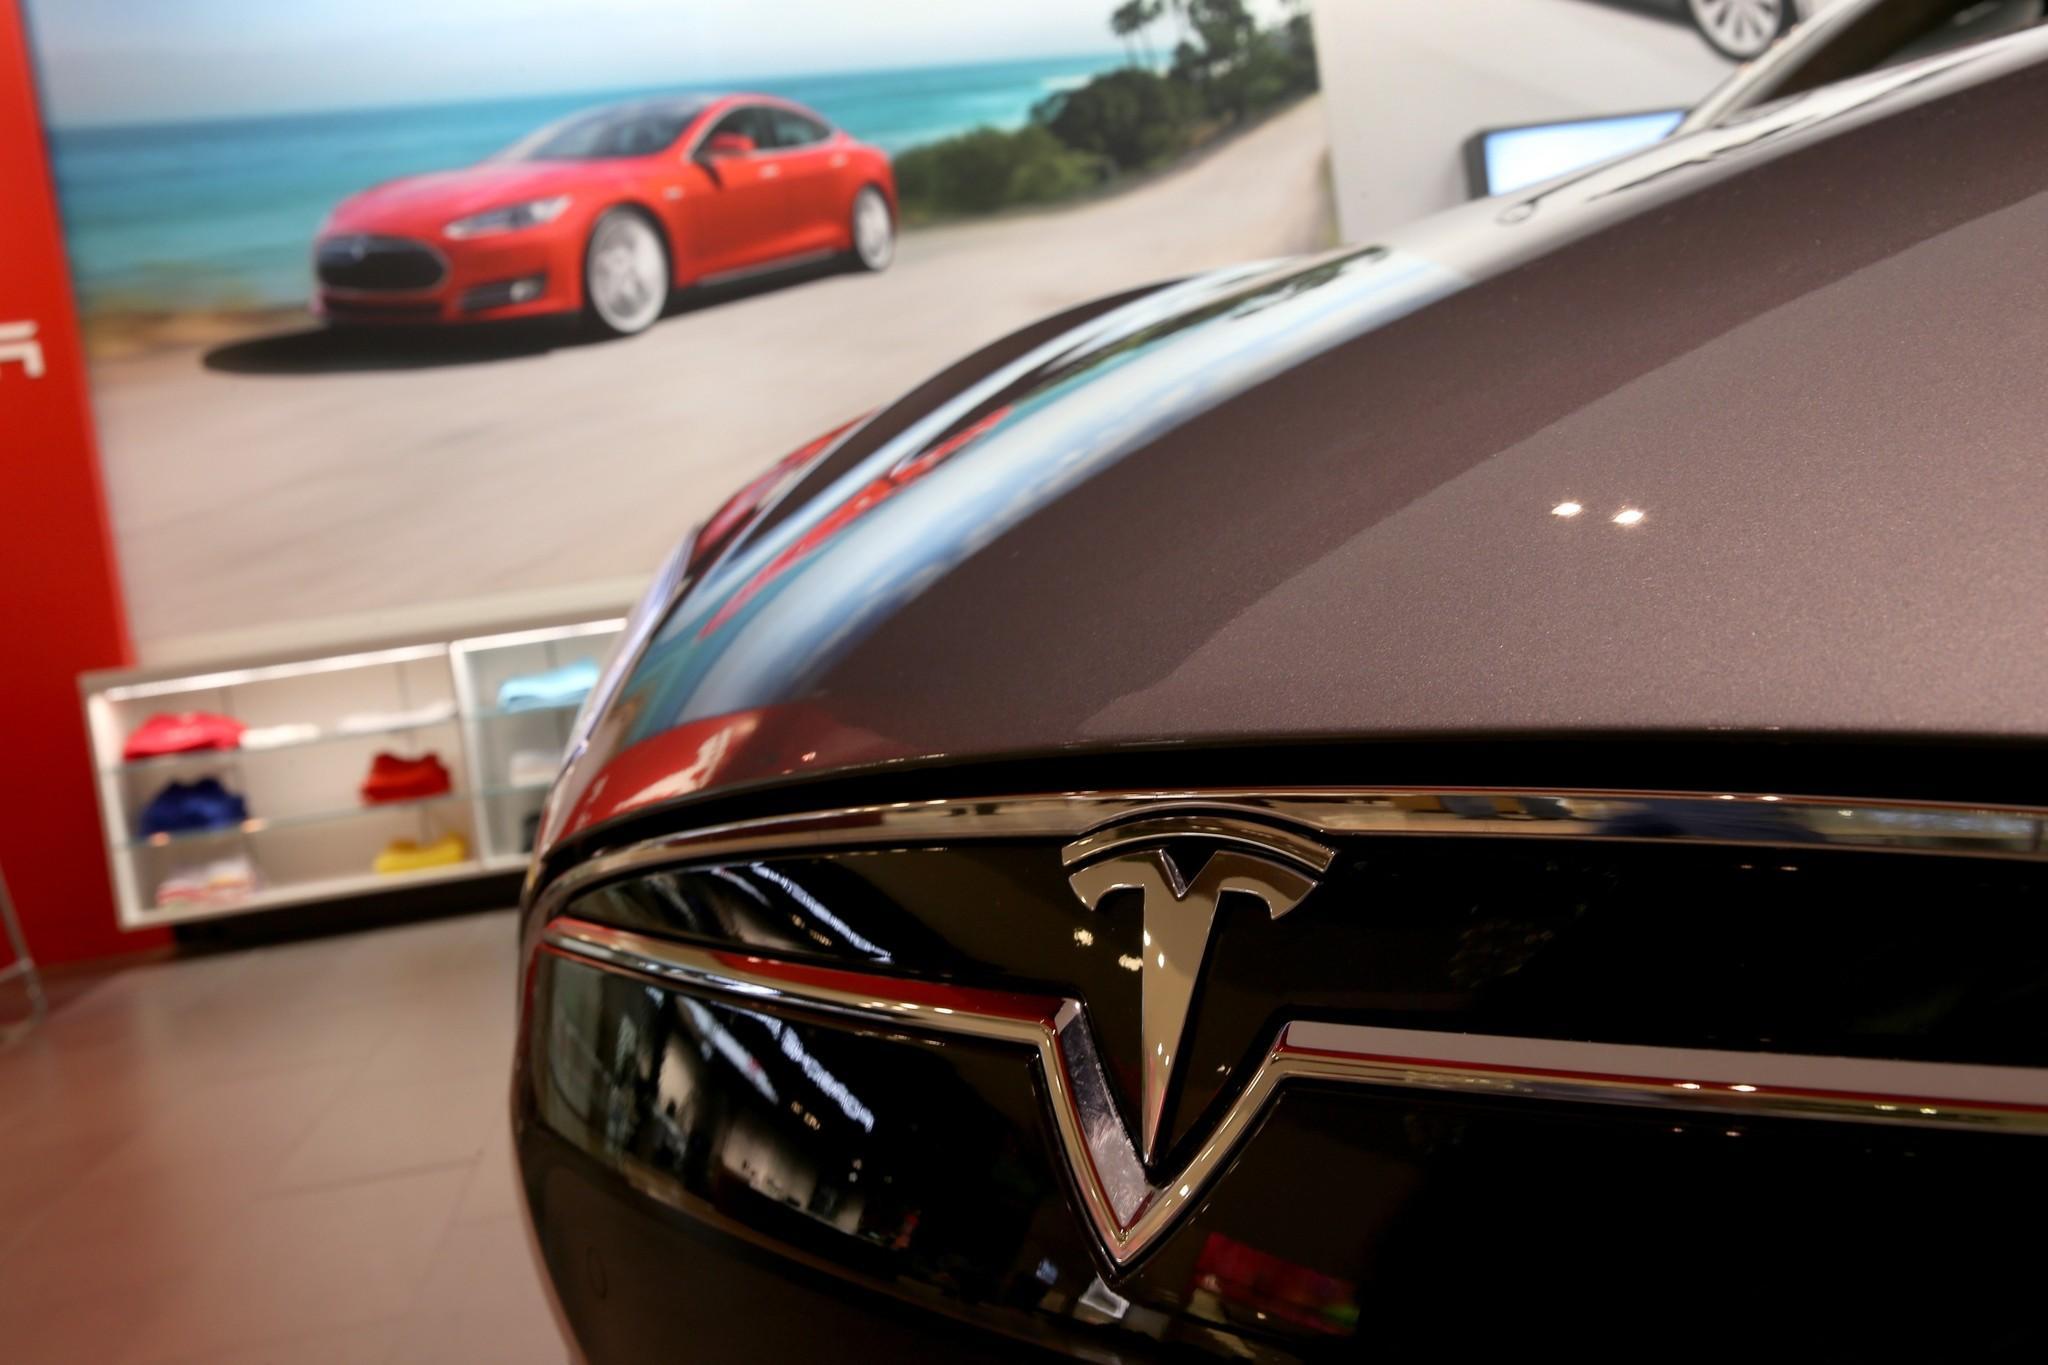 Consumer Reports Names Tesla Top Pick In Annual Car Rankings Latimes - Sports car rankings